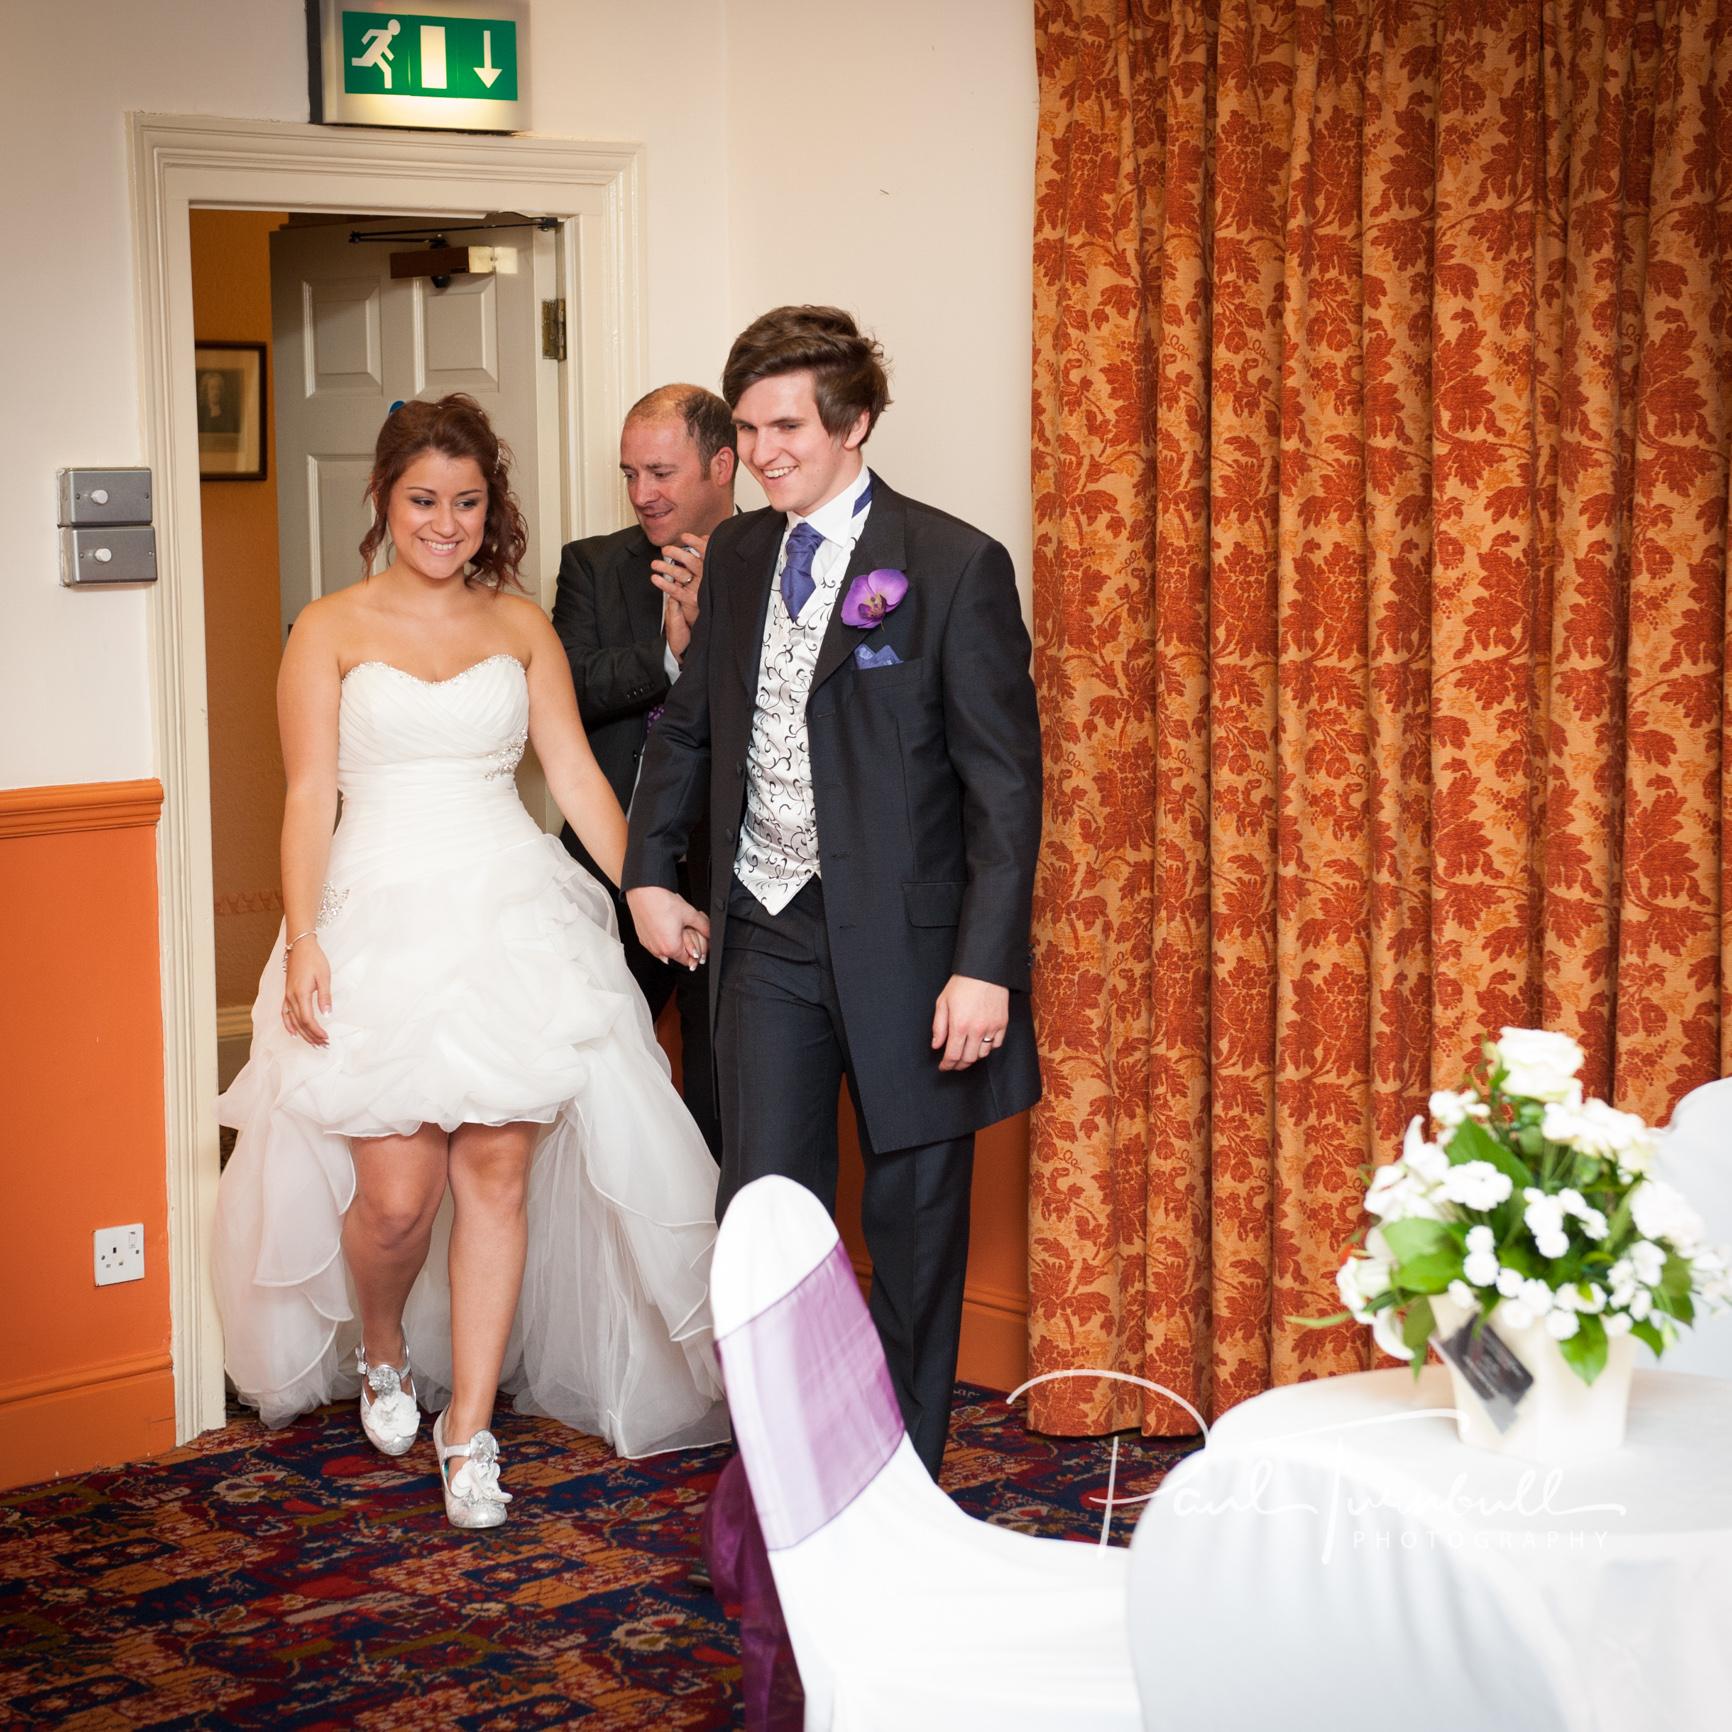 wedding-photography-healds-hall-liversedge-yorkshire-080.jpg